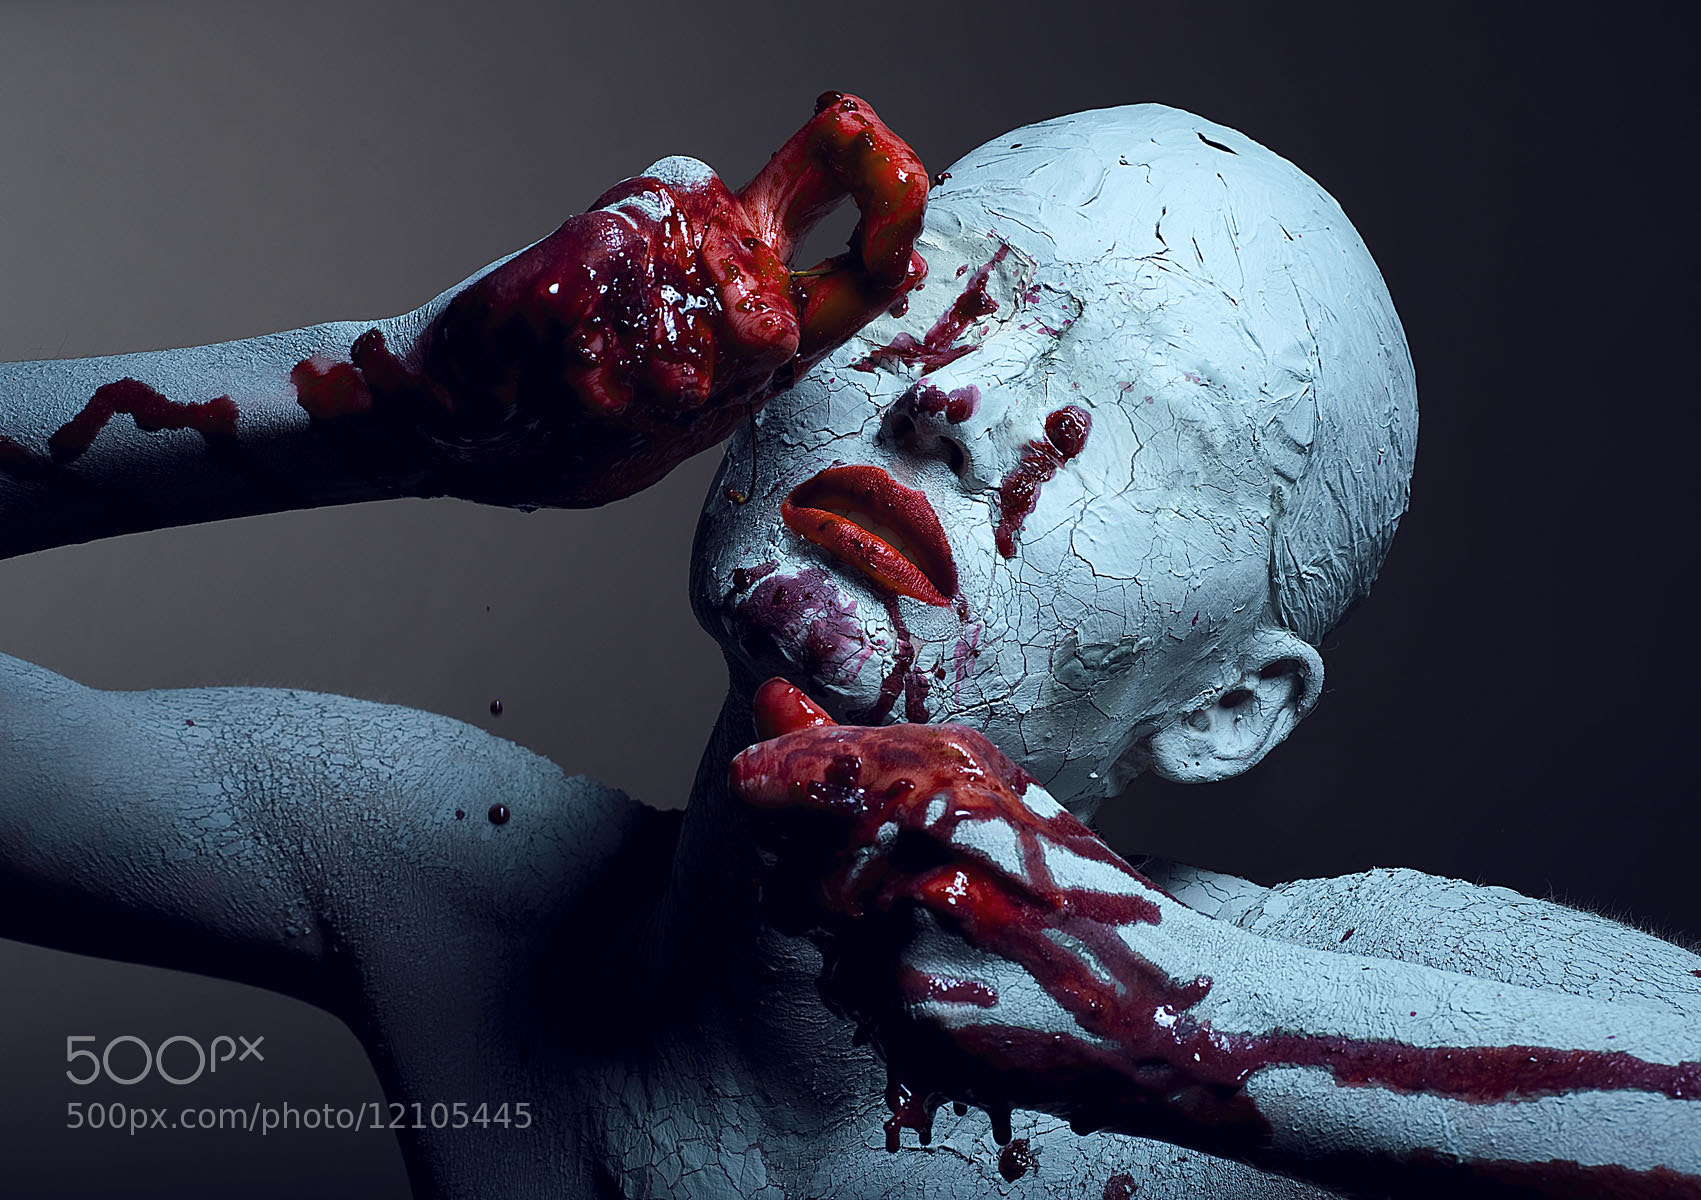 Photograph Untitled by Коногорова Евгения on 500px